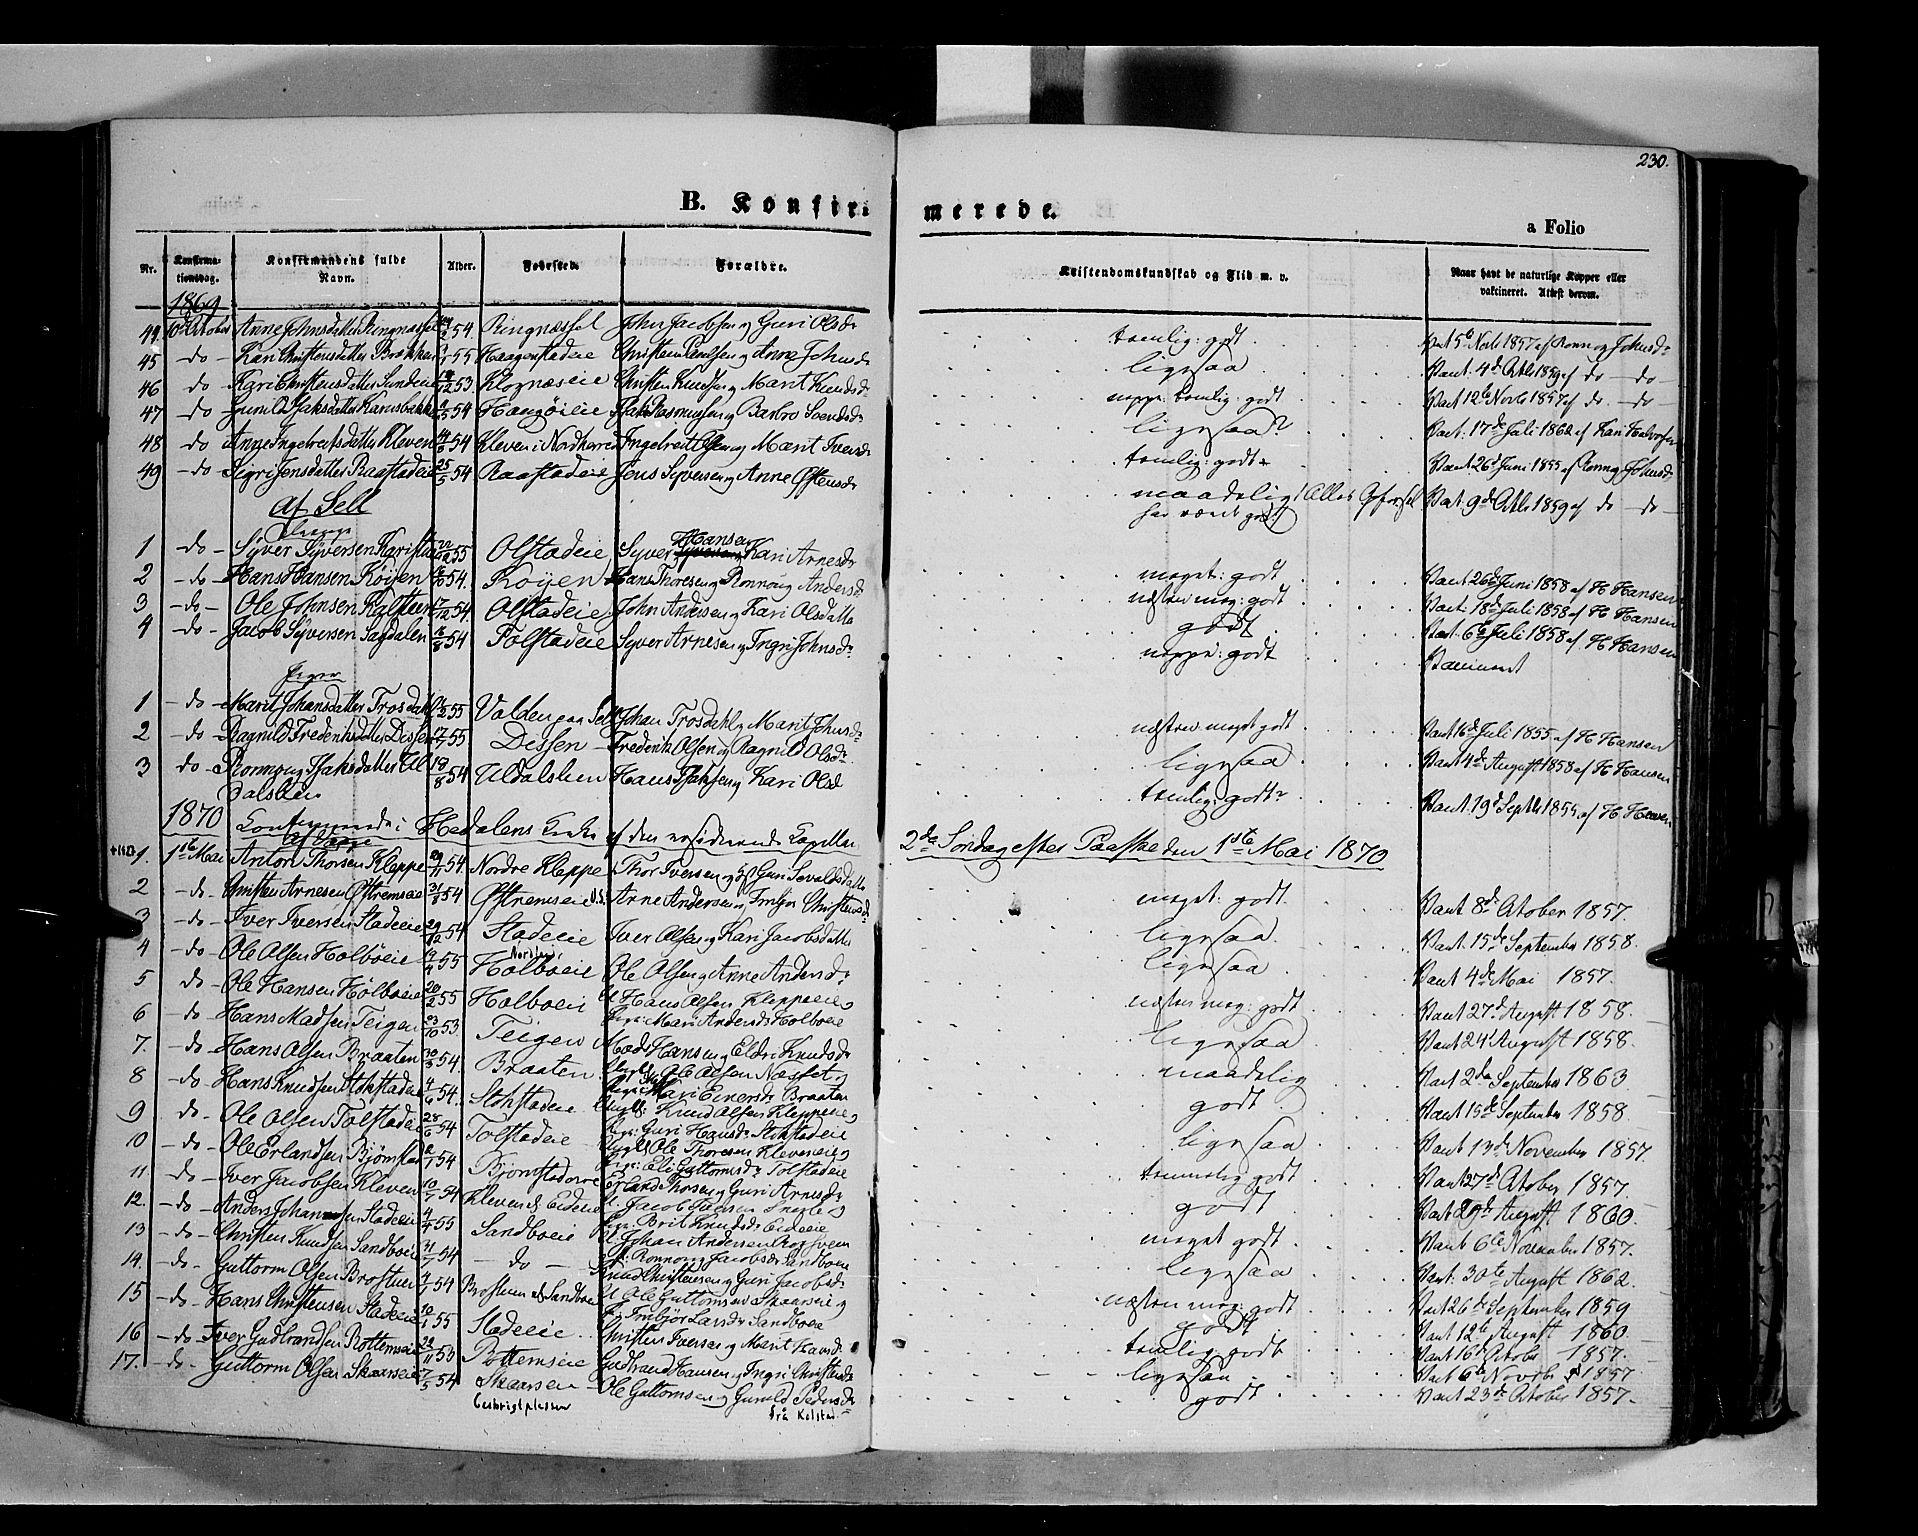 SAH, Vågå prestekontor, Ministerialbok nr. 6 /1, 1856-1872, s. 230